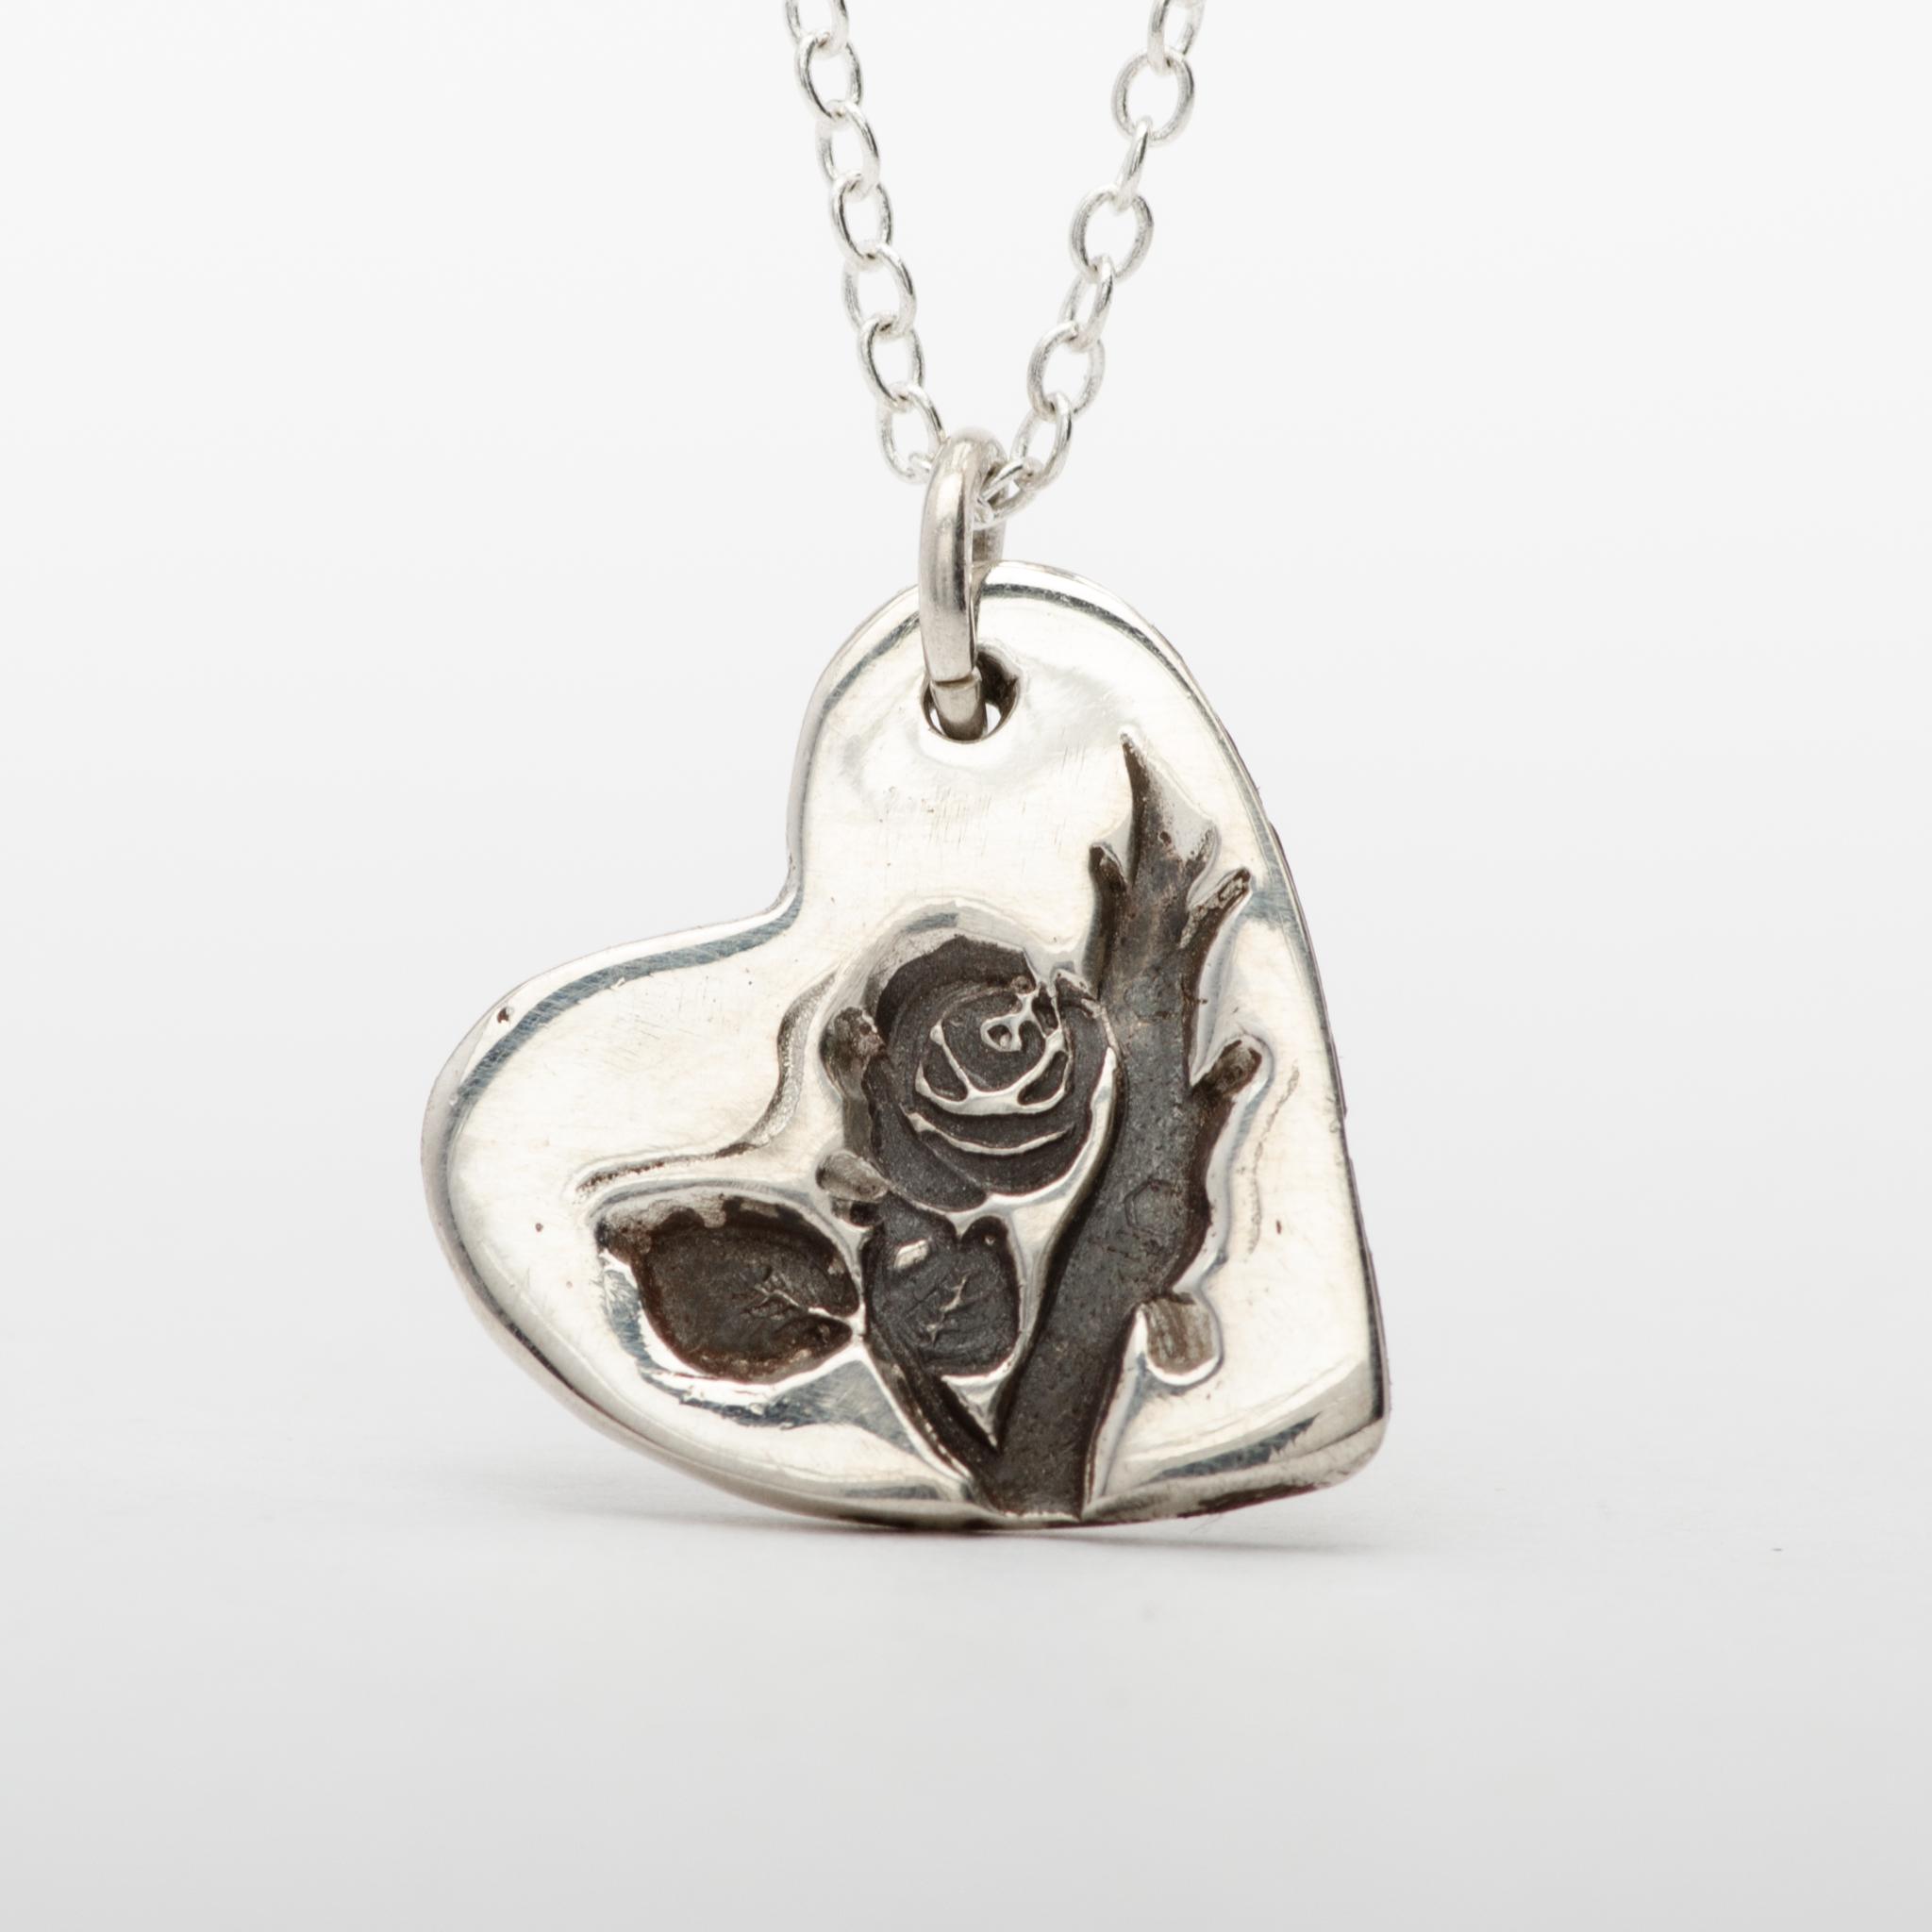 Silver Heart Rose Pendant Necklace